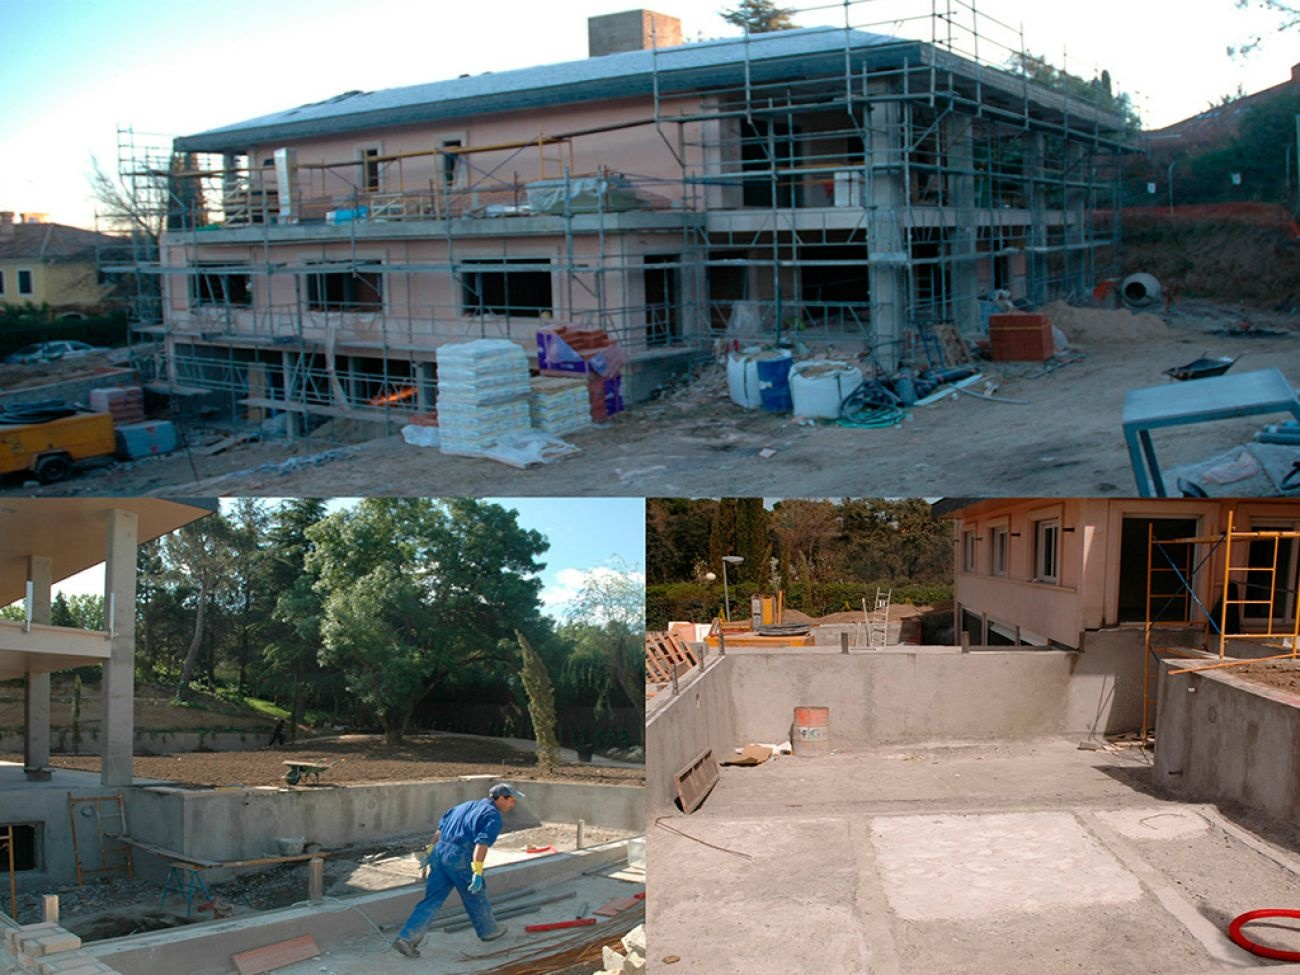 Construcci n de piscina desbordante infinity en madrid for Construccion de piscinas en madrid